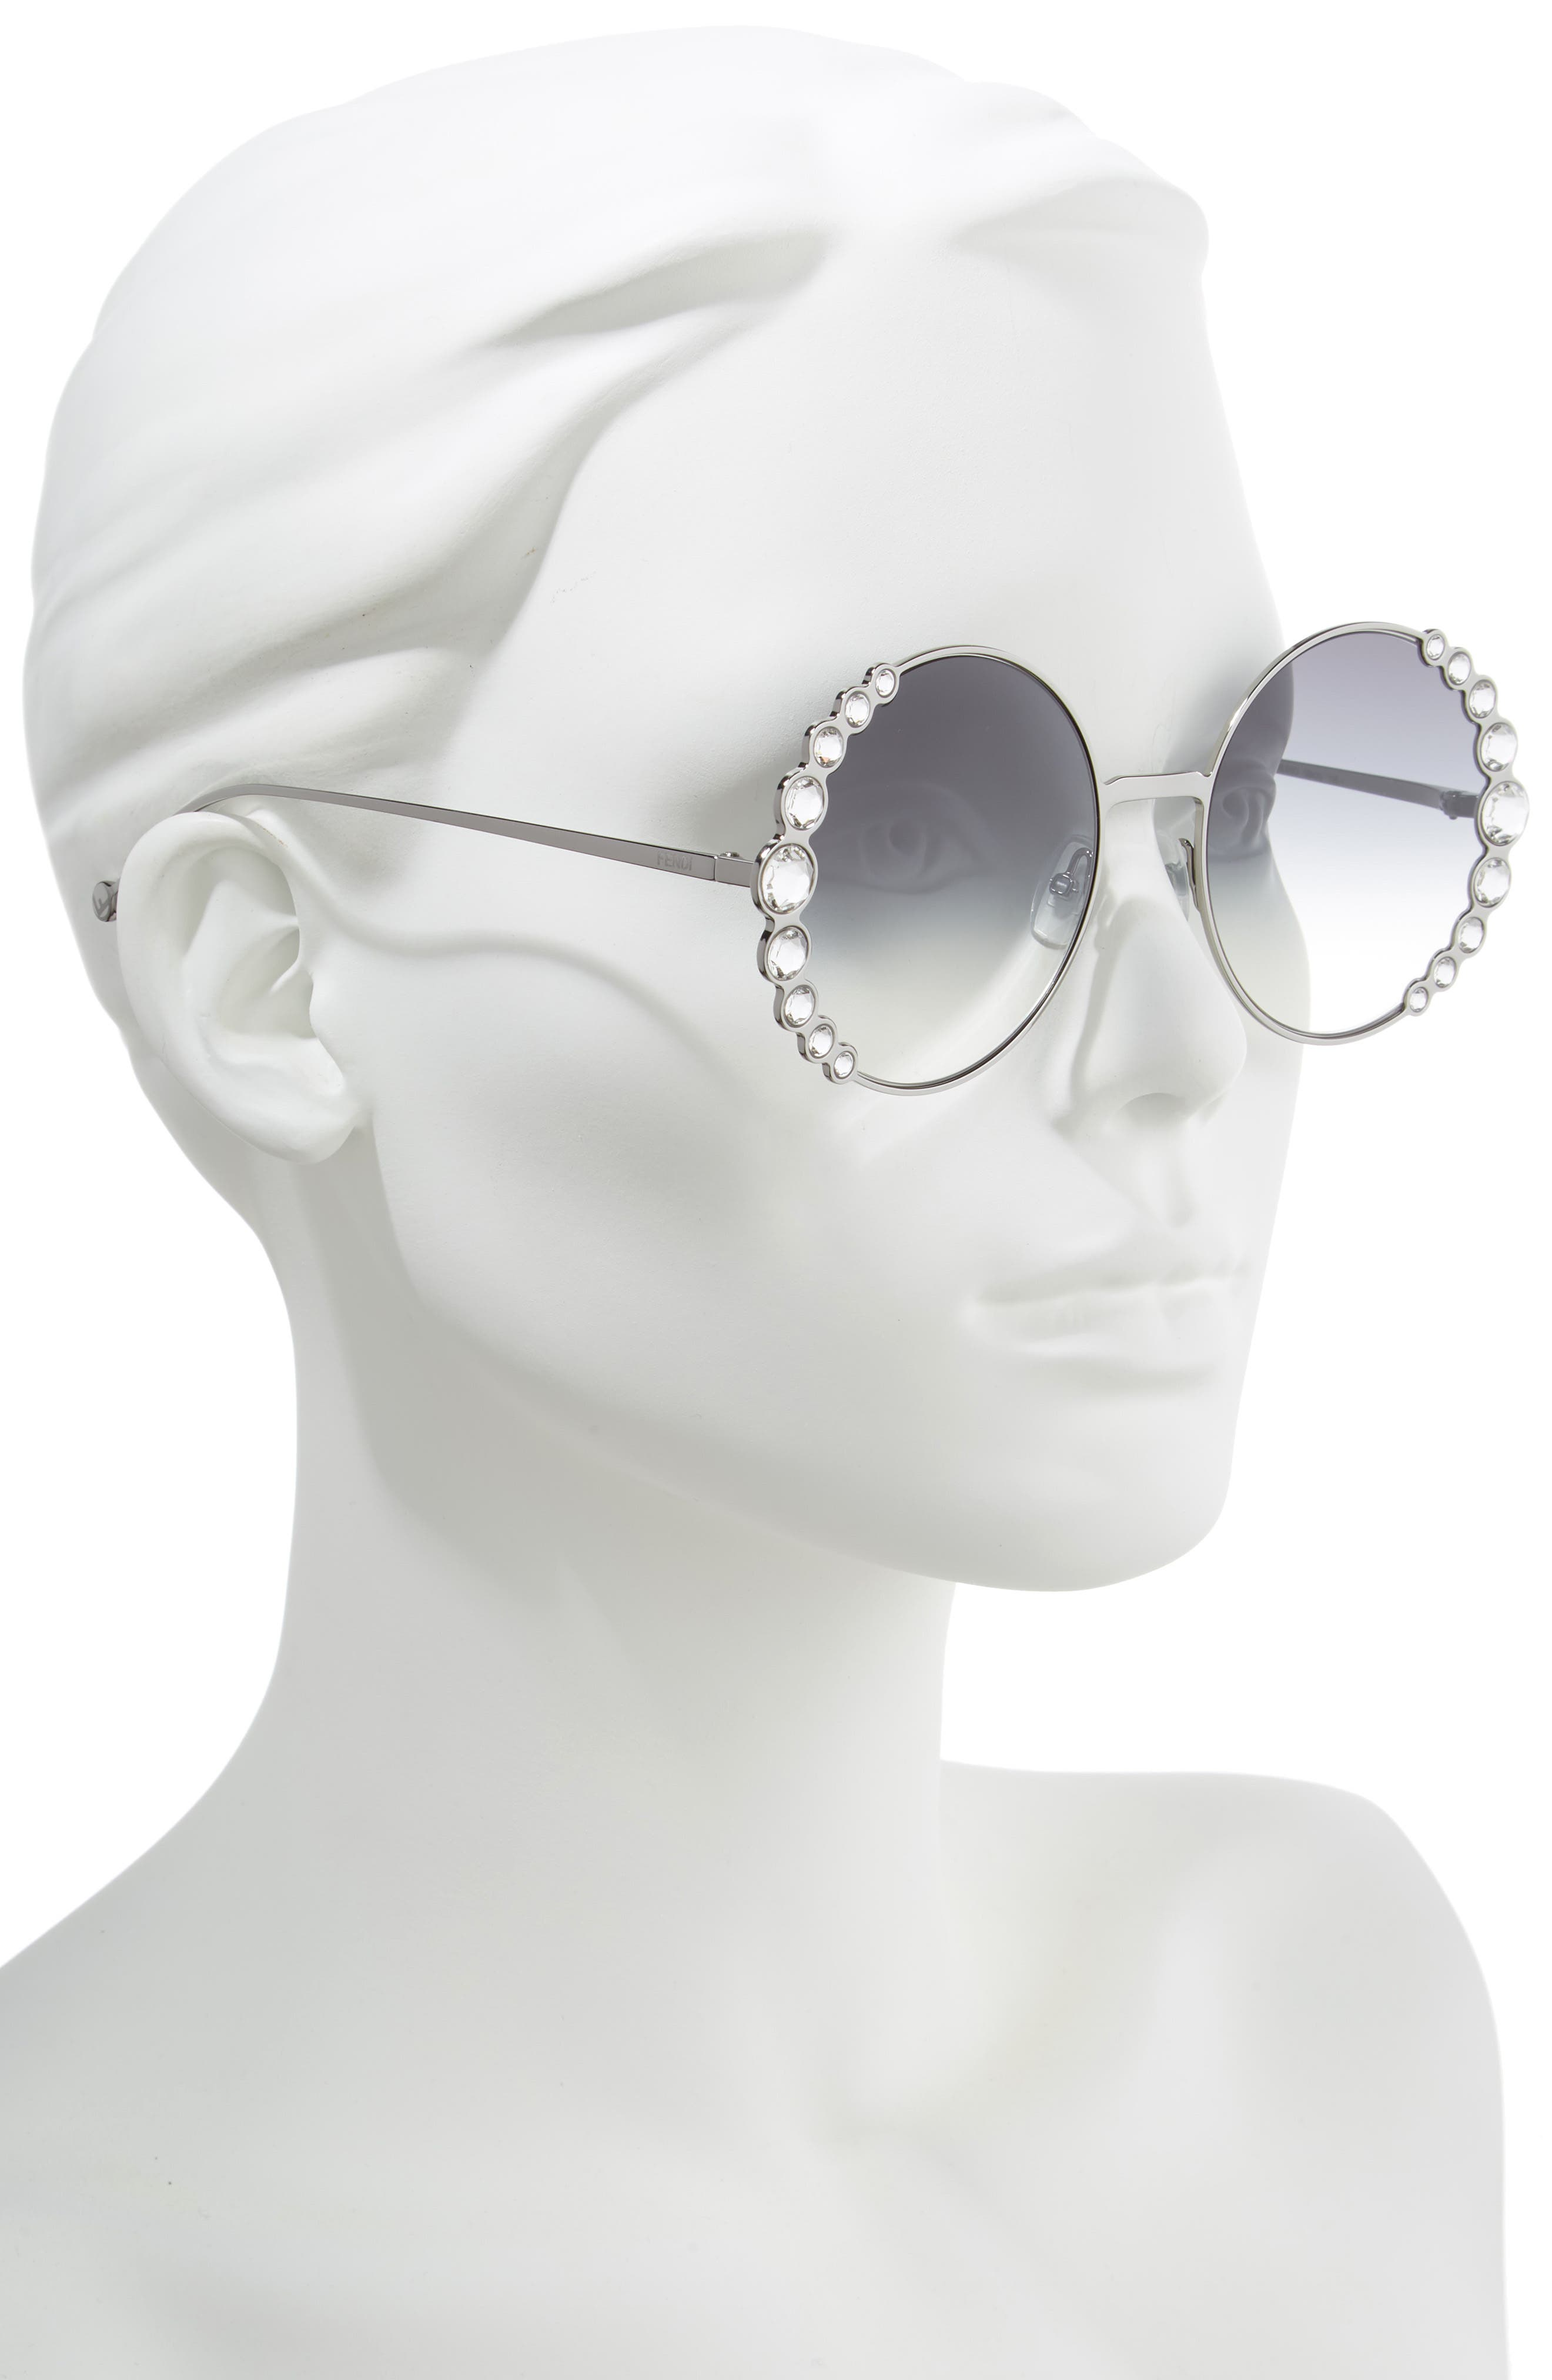 58mm Round Sunglasses,                             Alternate thumbnail 2, color,                             RUTHENIUM